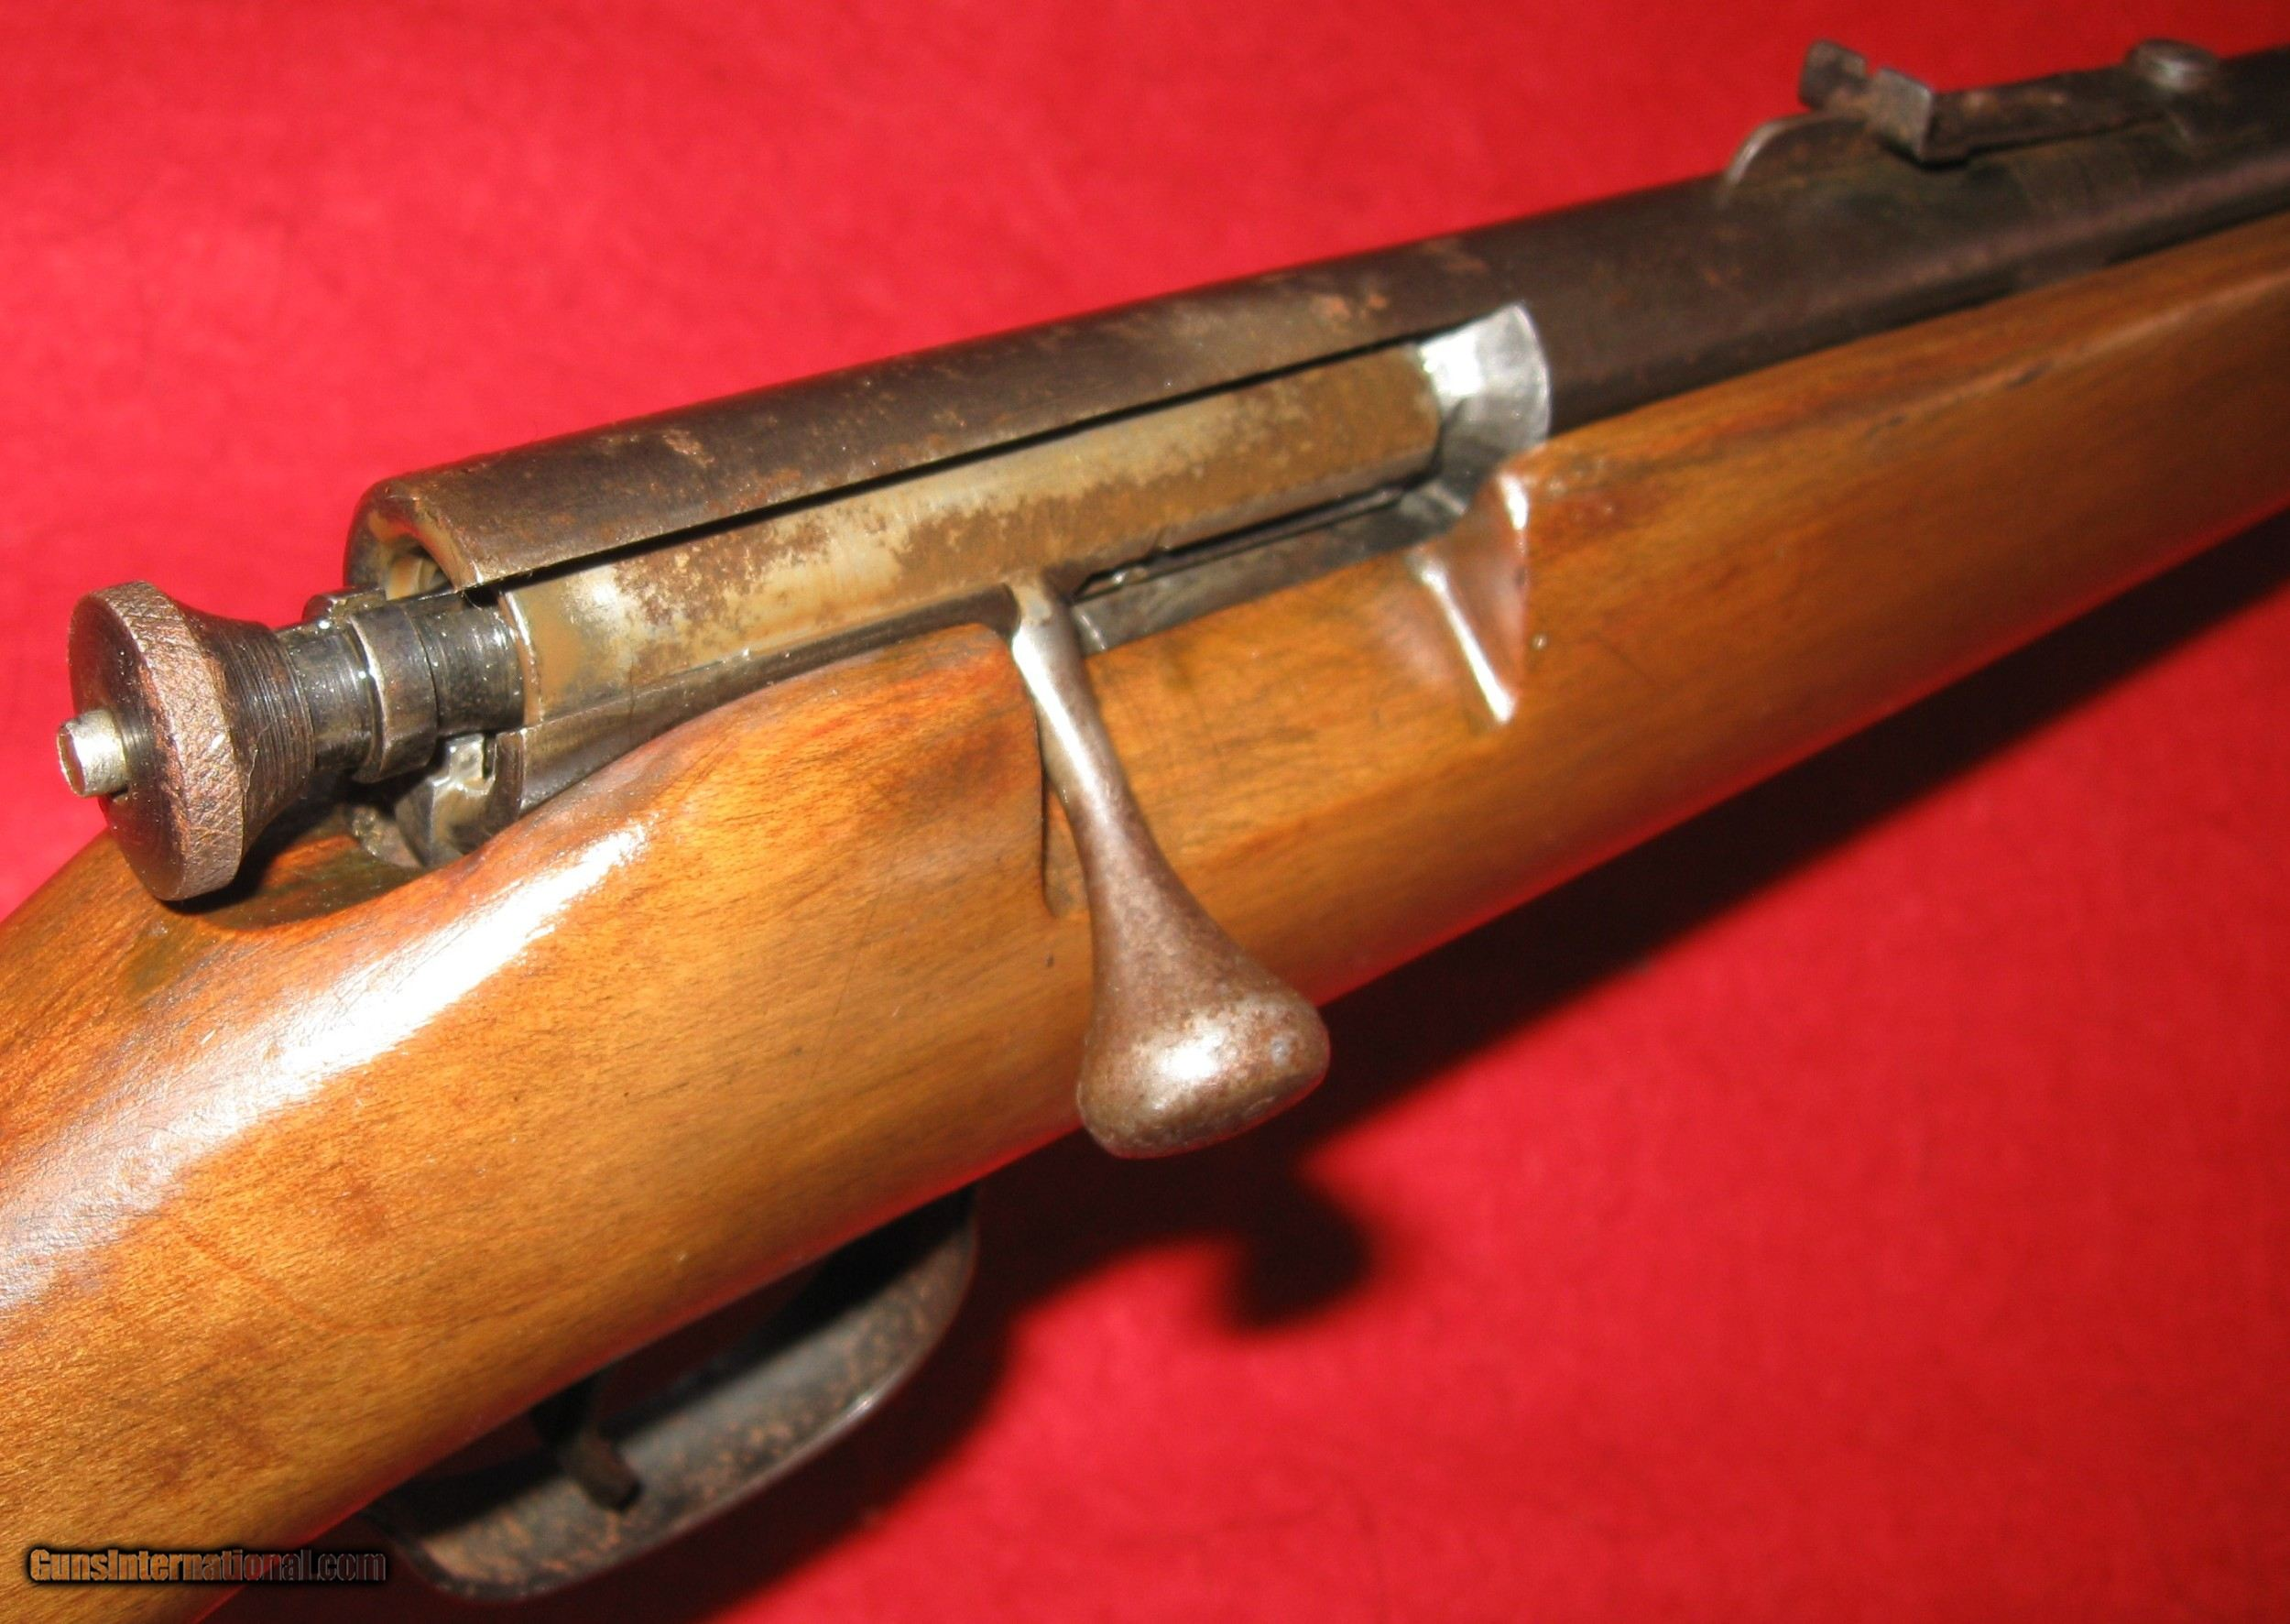 JC HIGGINS MODEL 101 24 (SEARS) 22 S,L,LR SINGLE SHOT BOLT